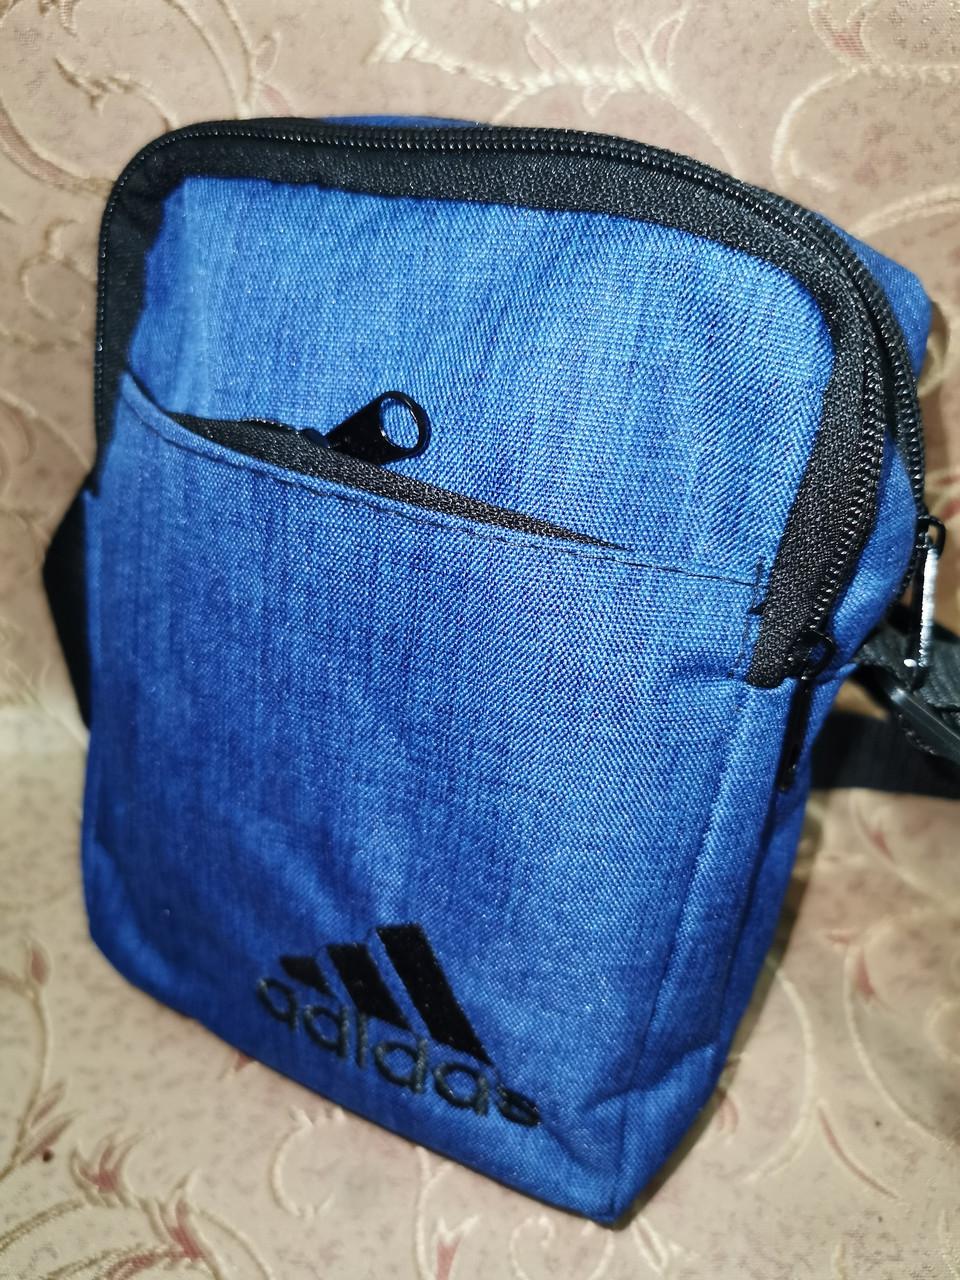 Барсетка adidas сумка спортивные мессенджер для через плечо Унисекс ОПТ